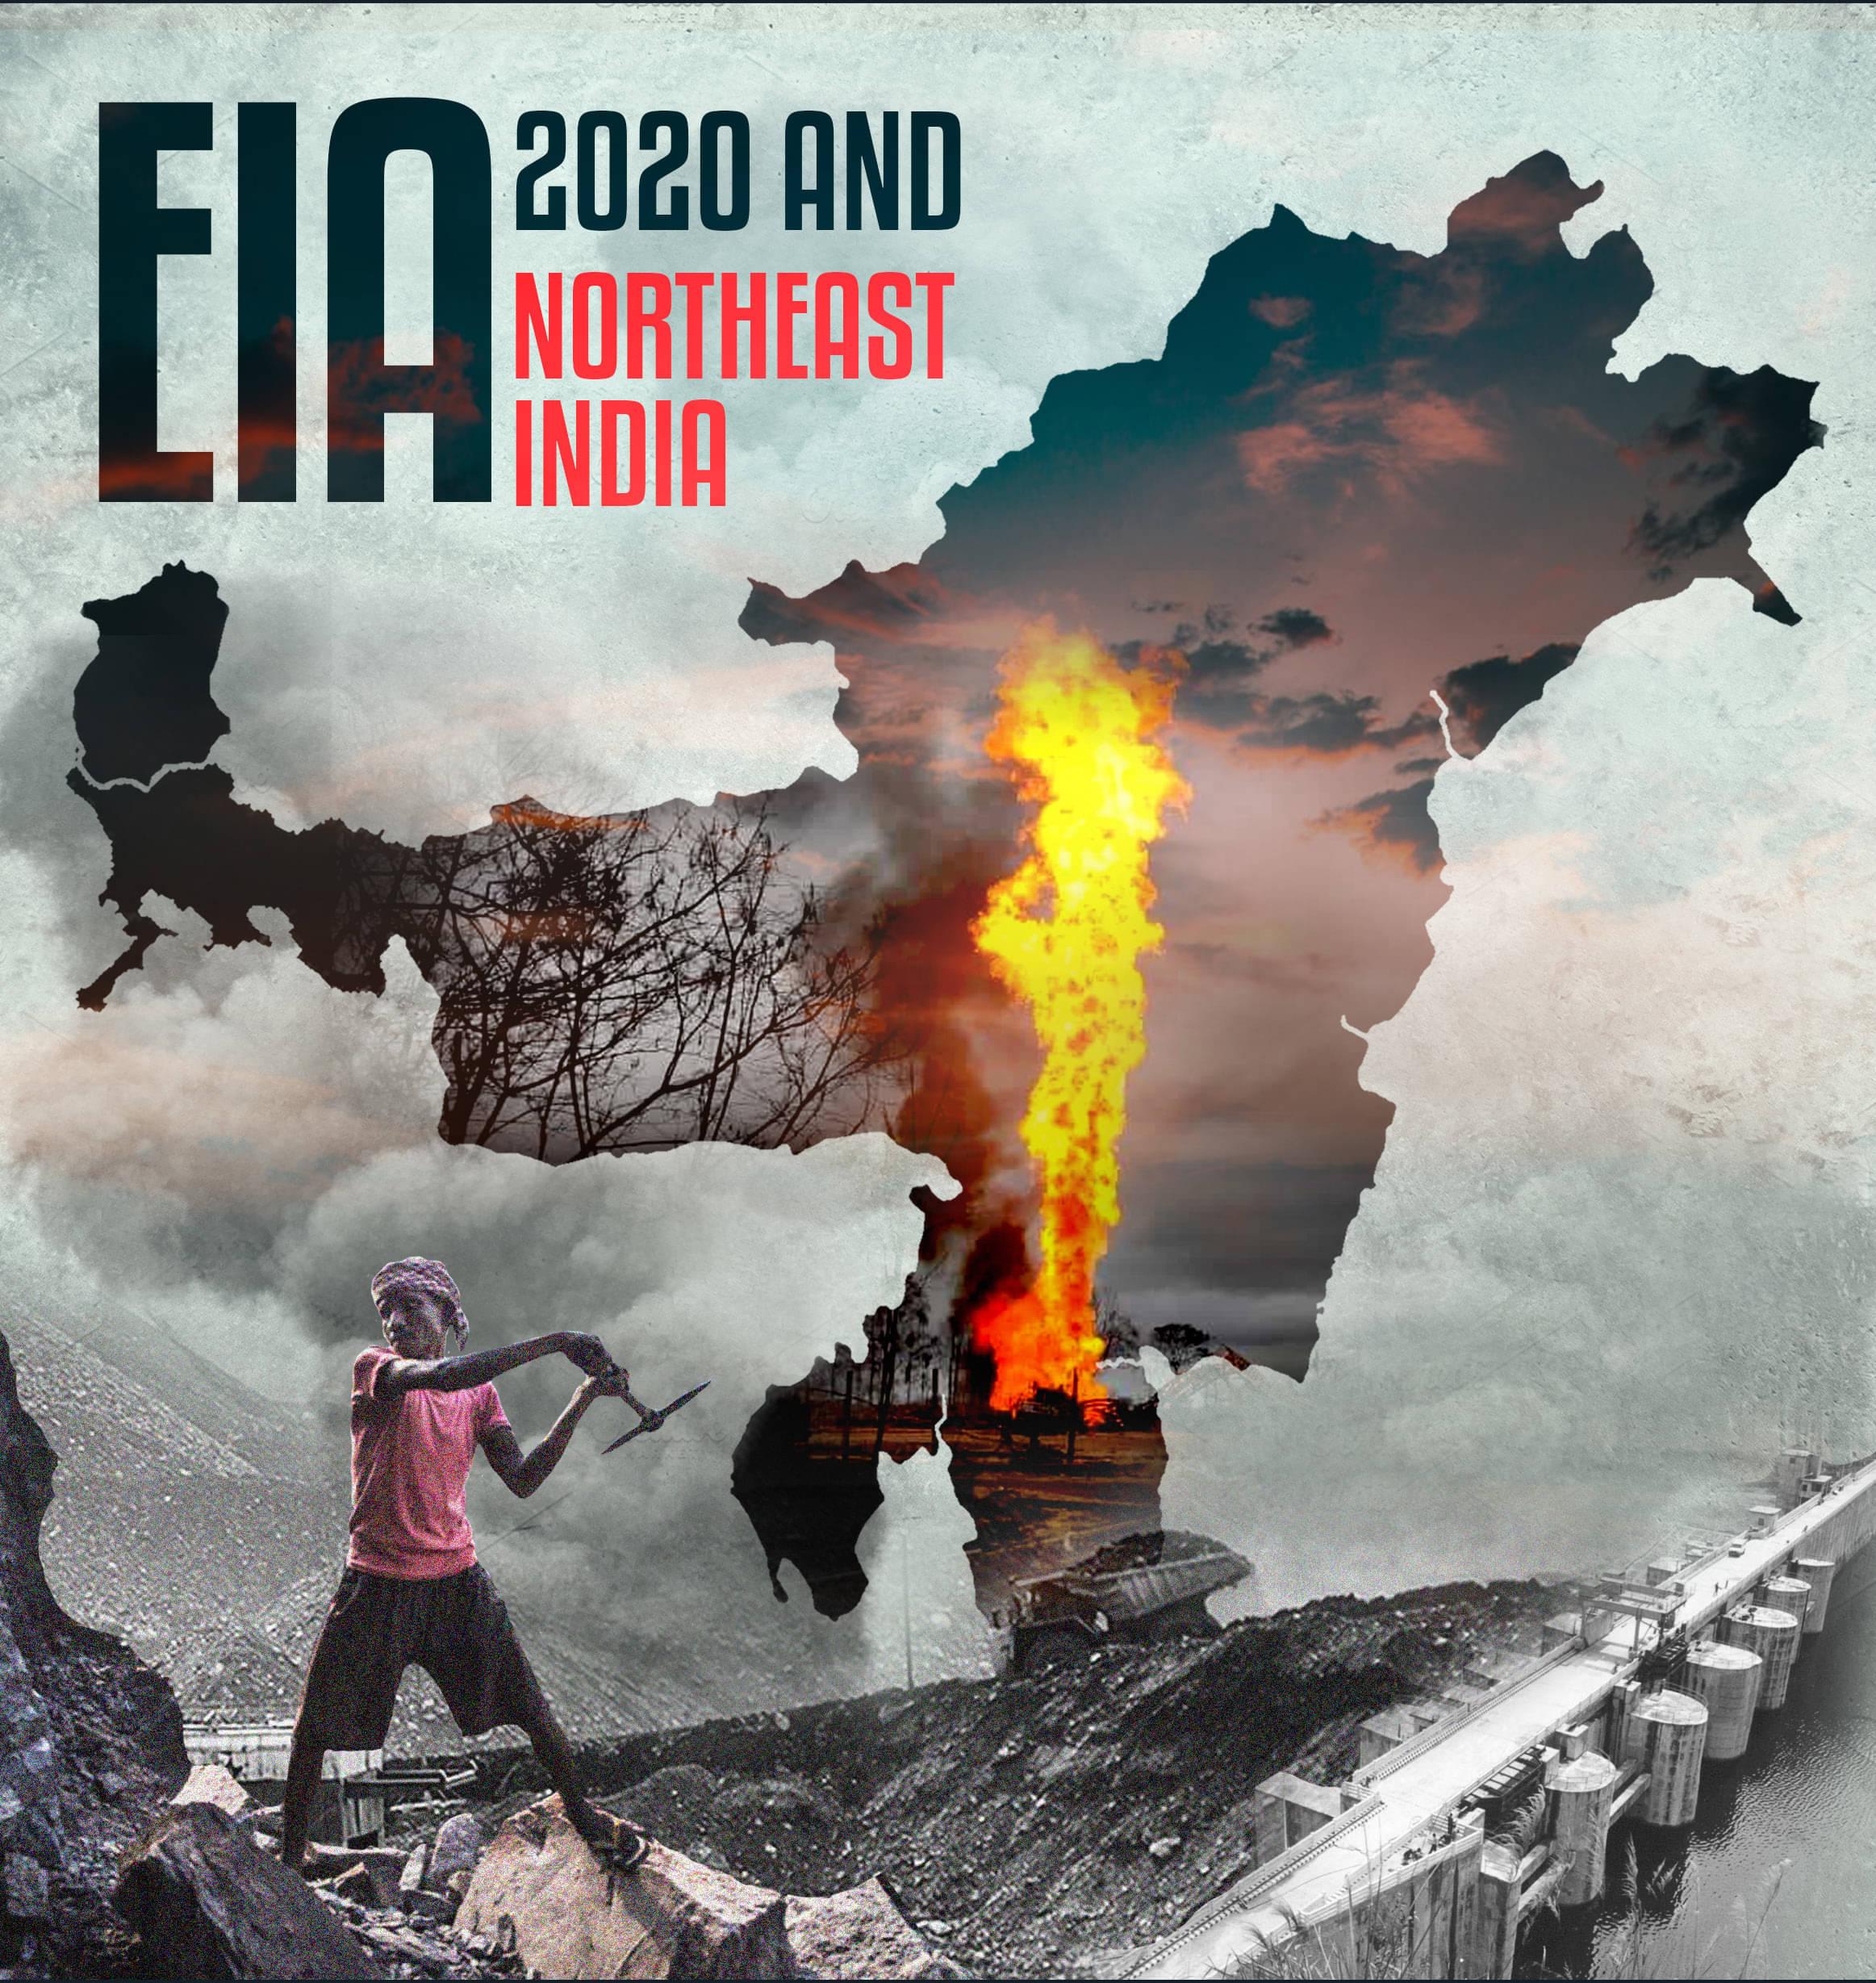 EIA 2020 AND NORTHEAST INDIA